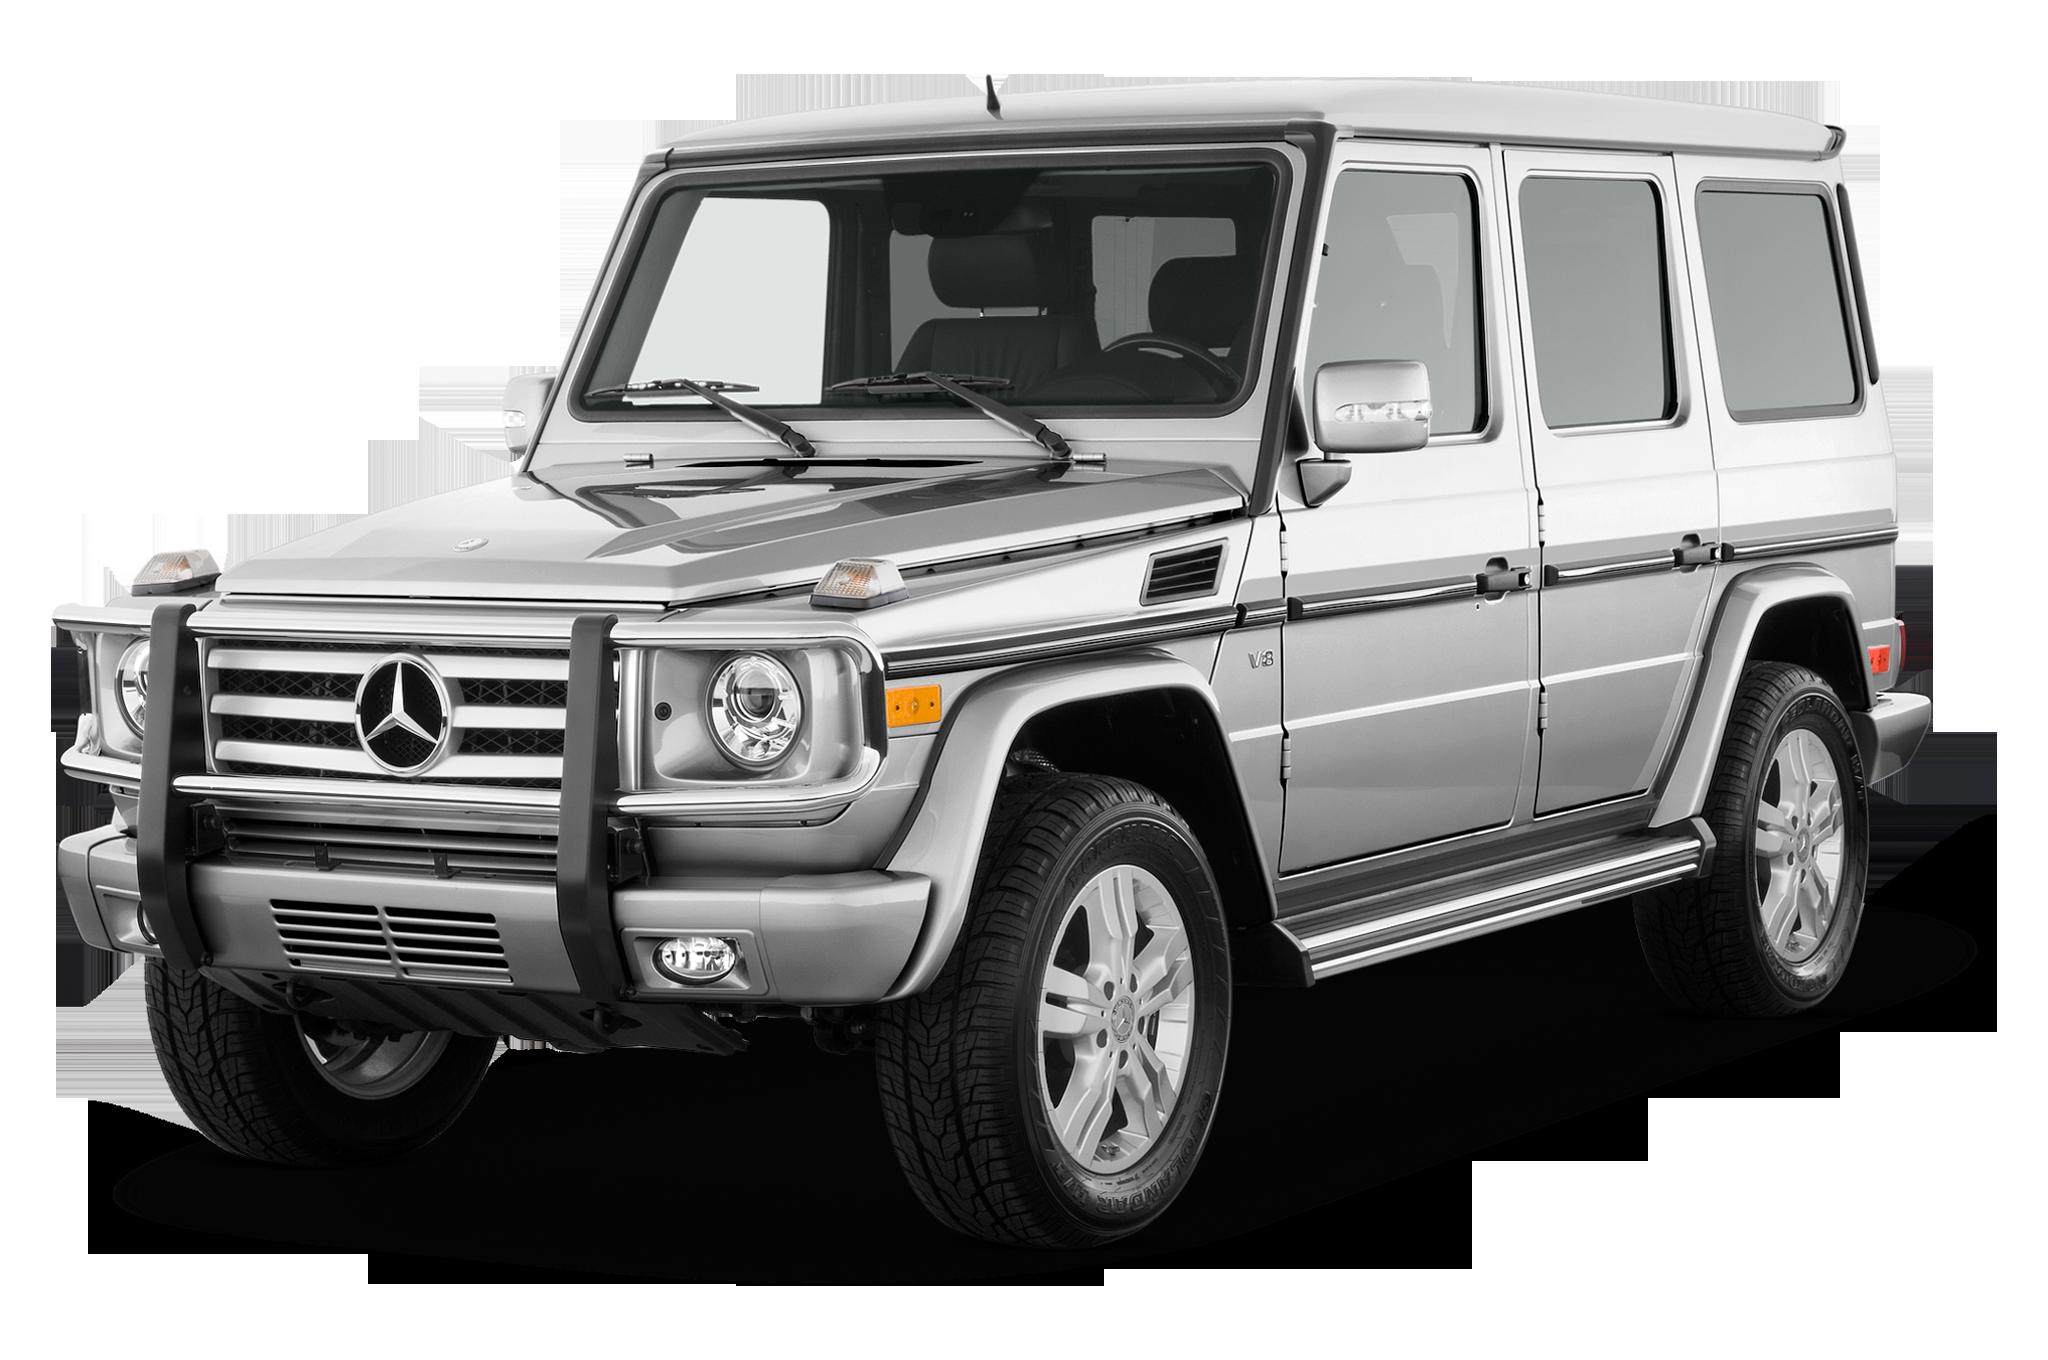 Mercedes-Benz G-klasse II (W463) Restyling 3 2012 - 2015 SUV #3